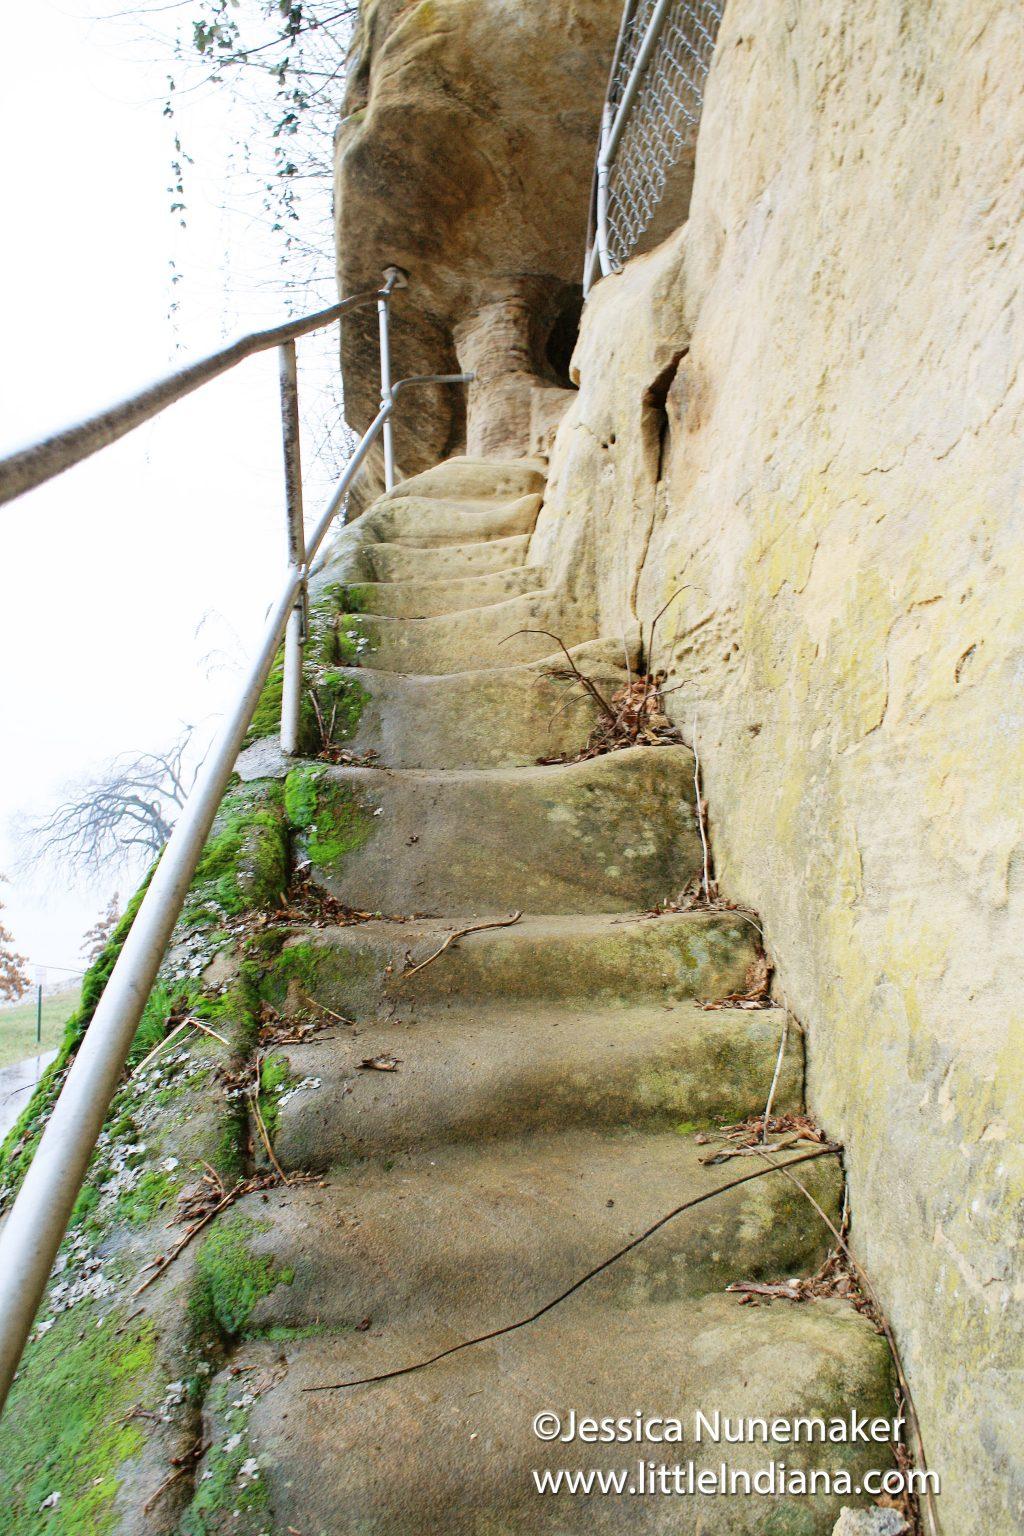 Indiana spencer county rockport - Rockport Bluffs Upper Cave In Rockport Indiana